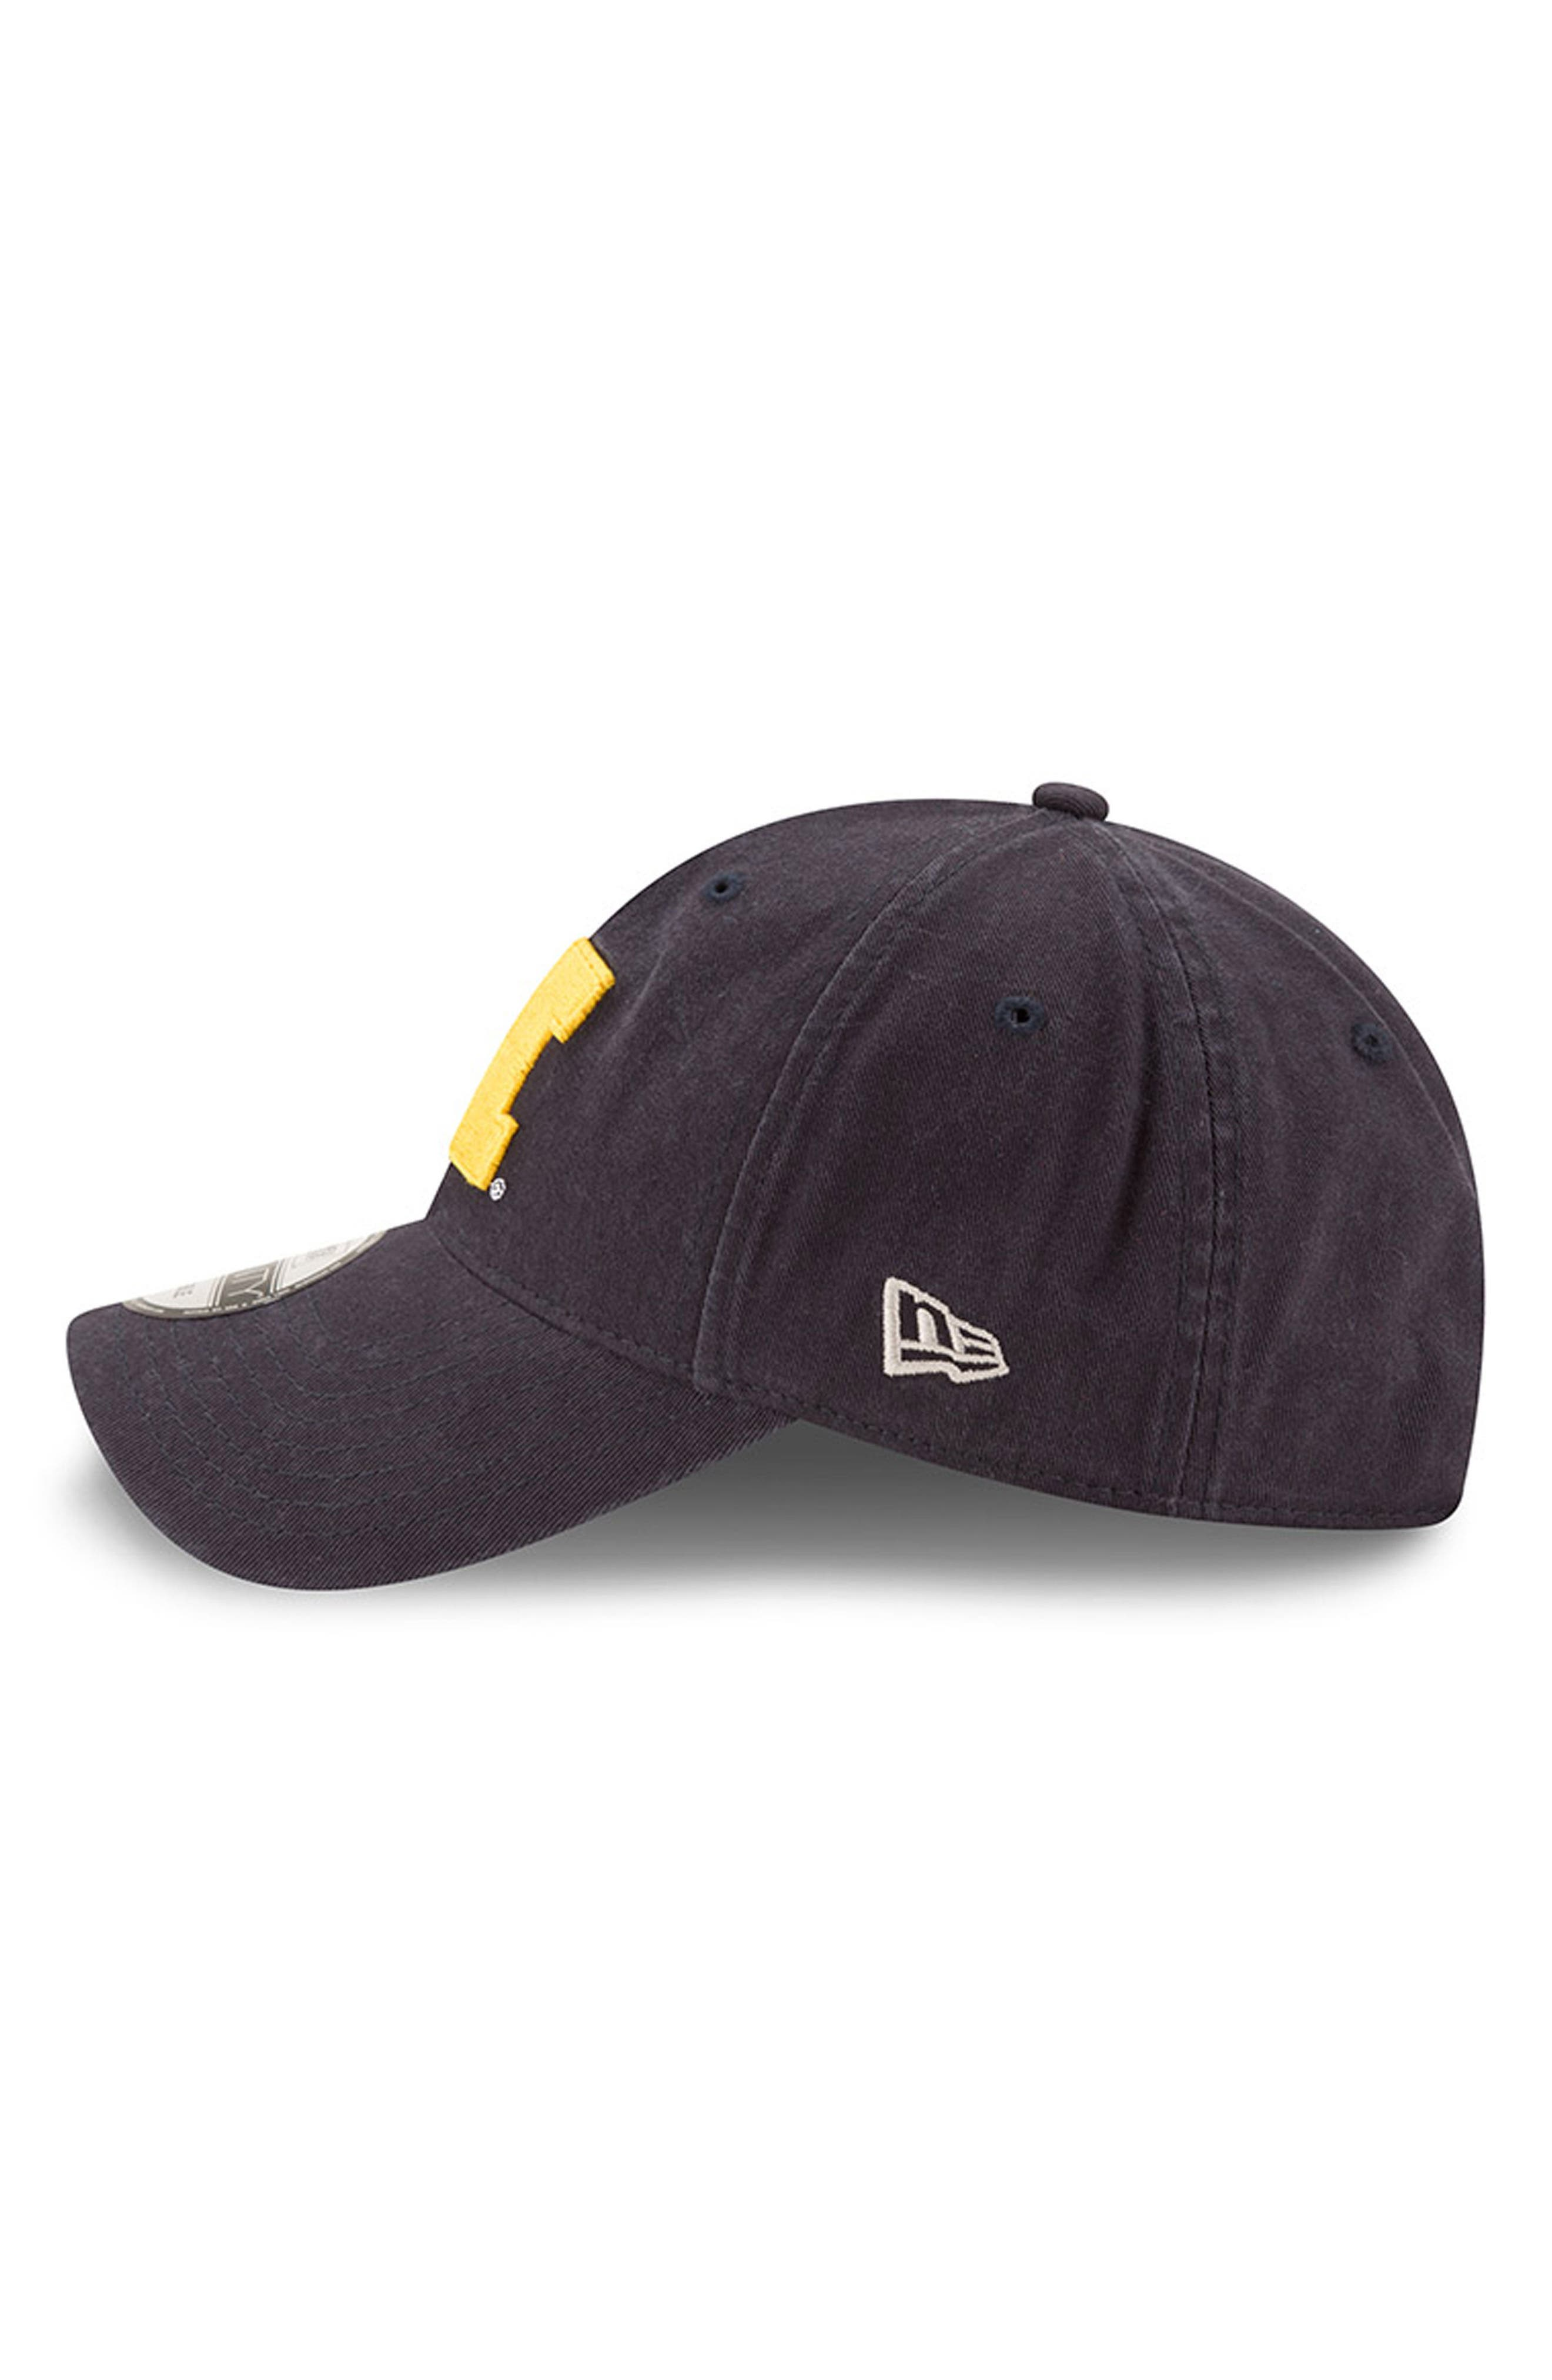 New Era Collegiate Core Classic - Michigan Wolverines Baseball Cap,                             Alternate thumbnail 5, color,                             410